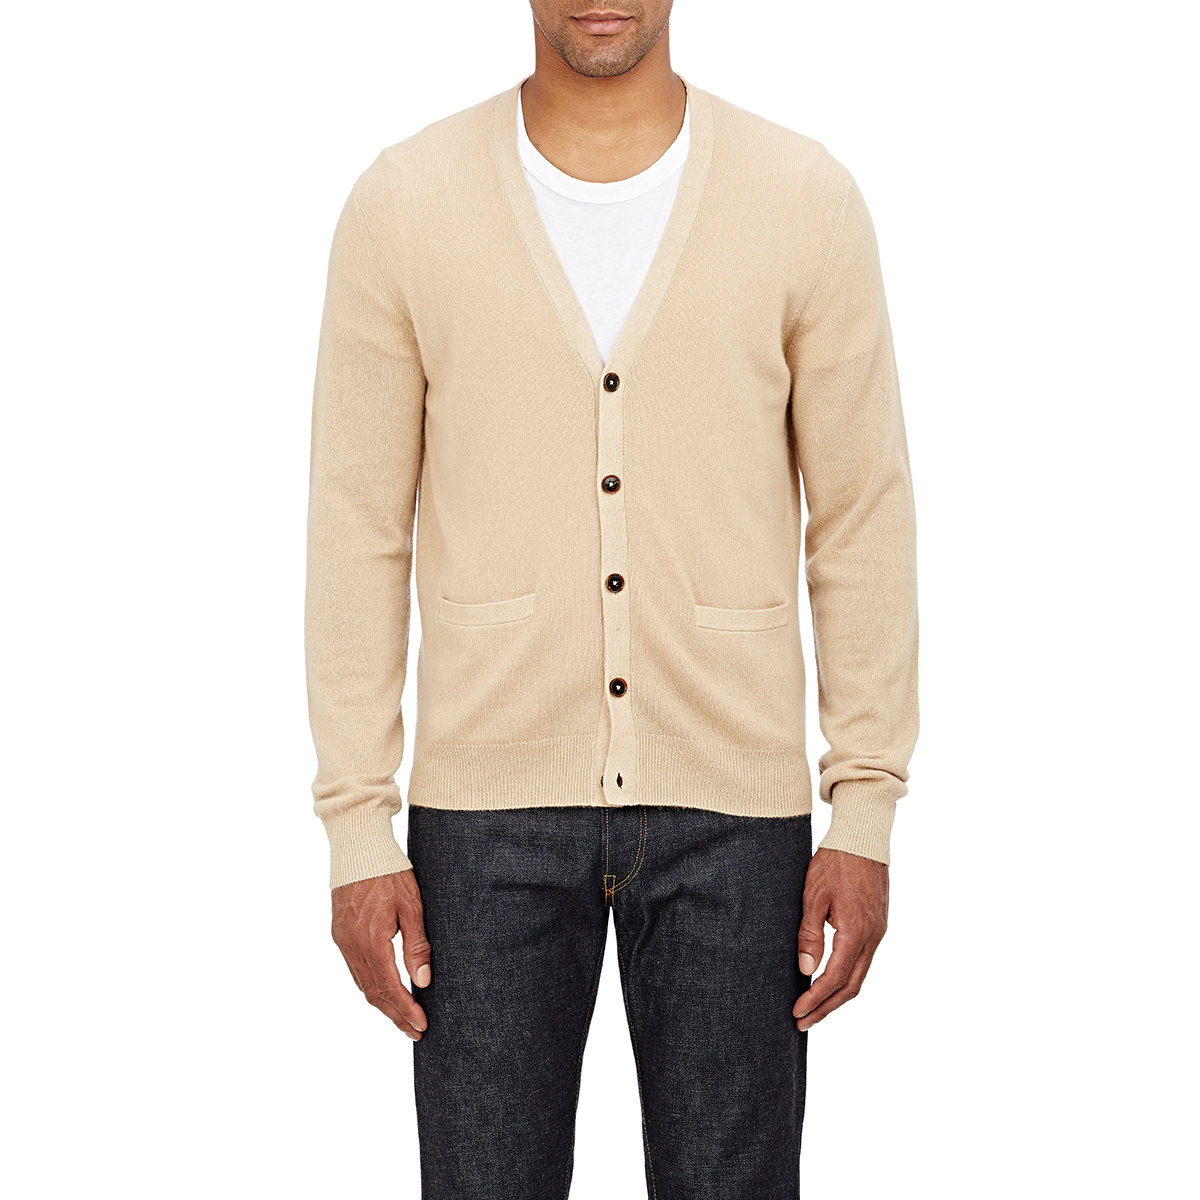 Ralph lauren black label Cashmere Sweater in Brown for Men | Lyst